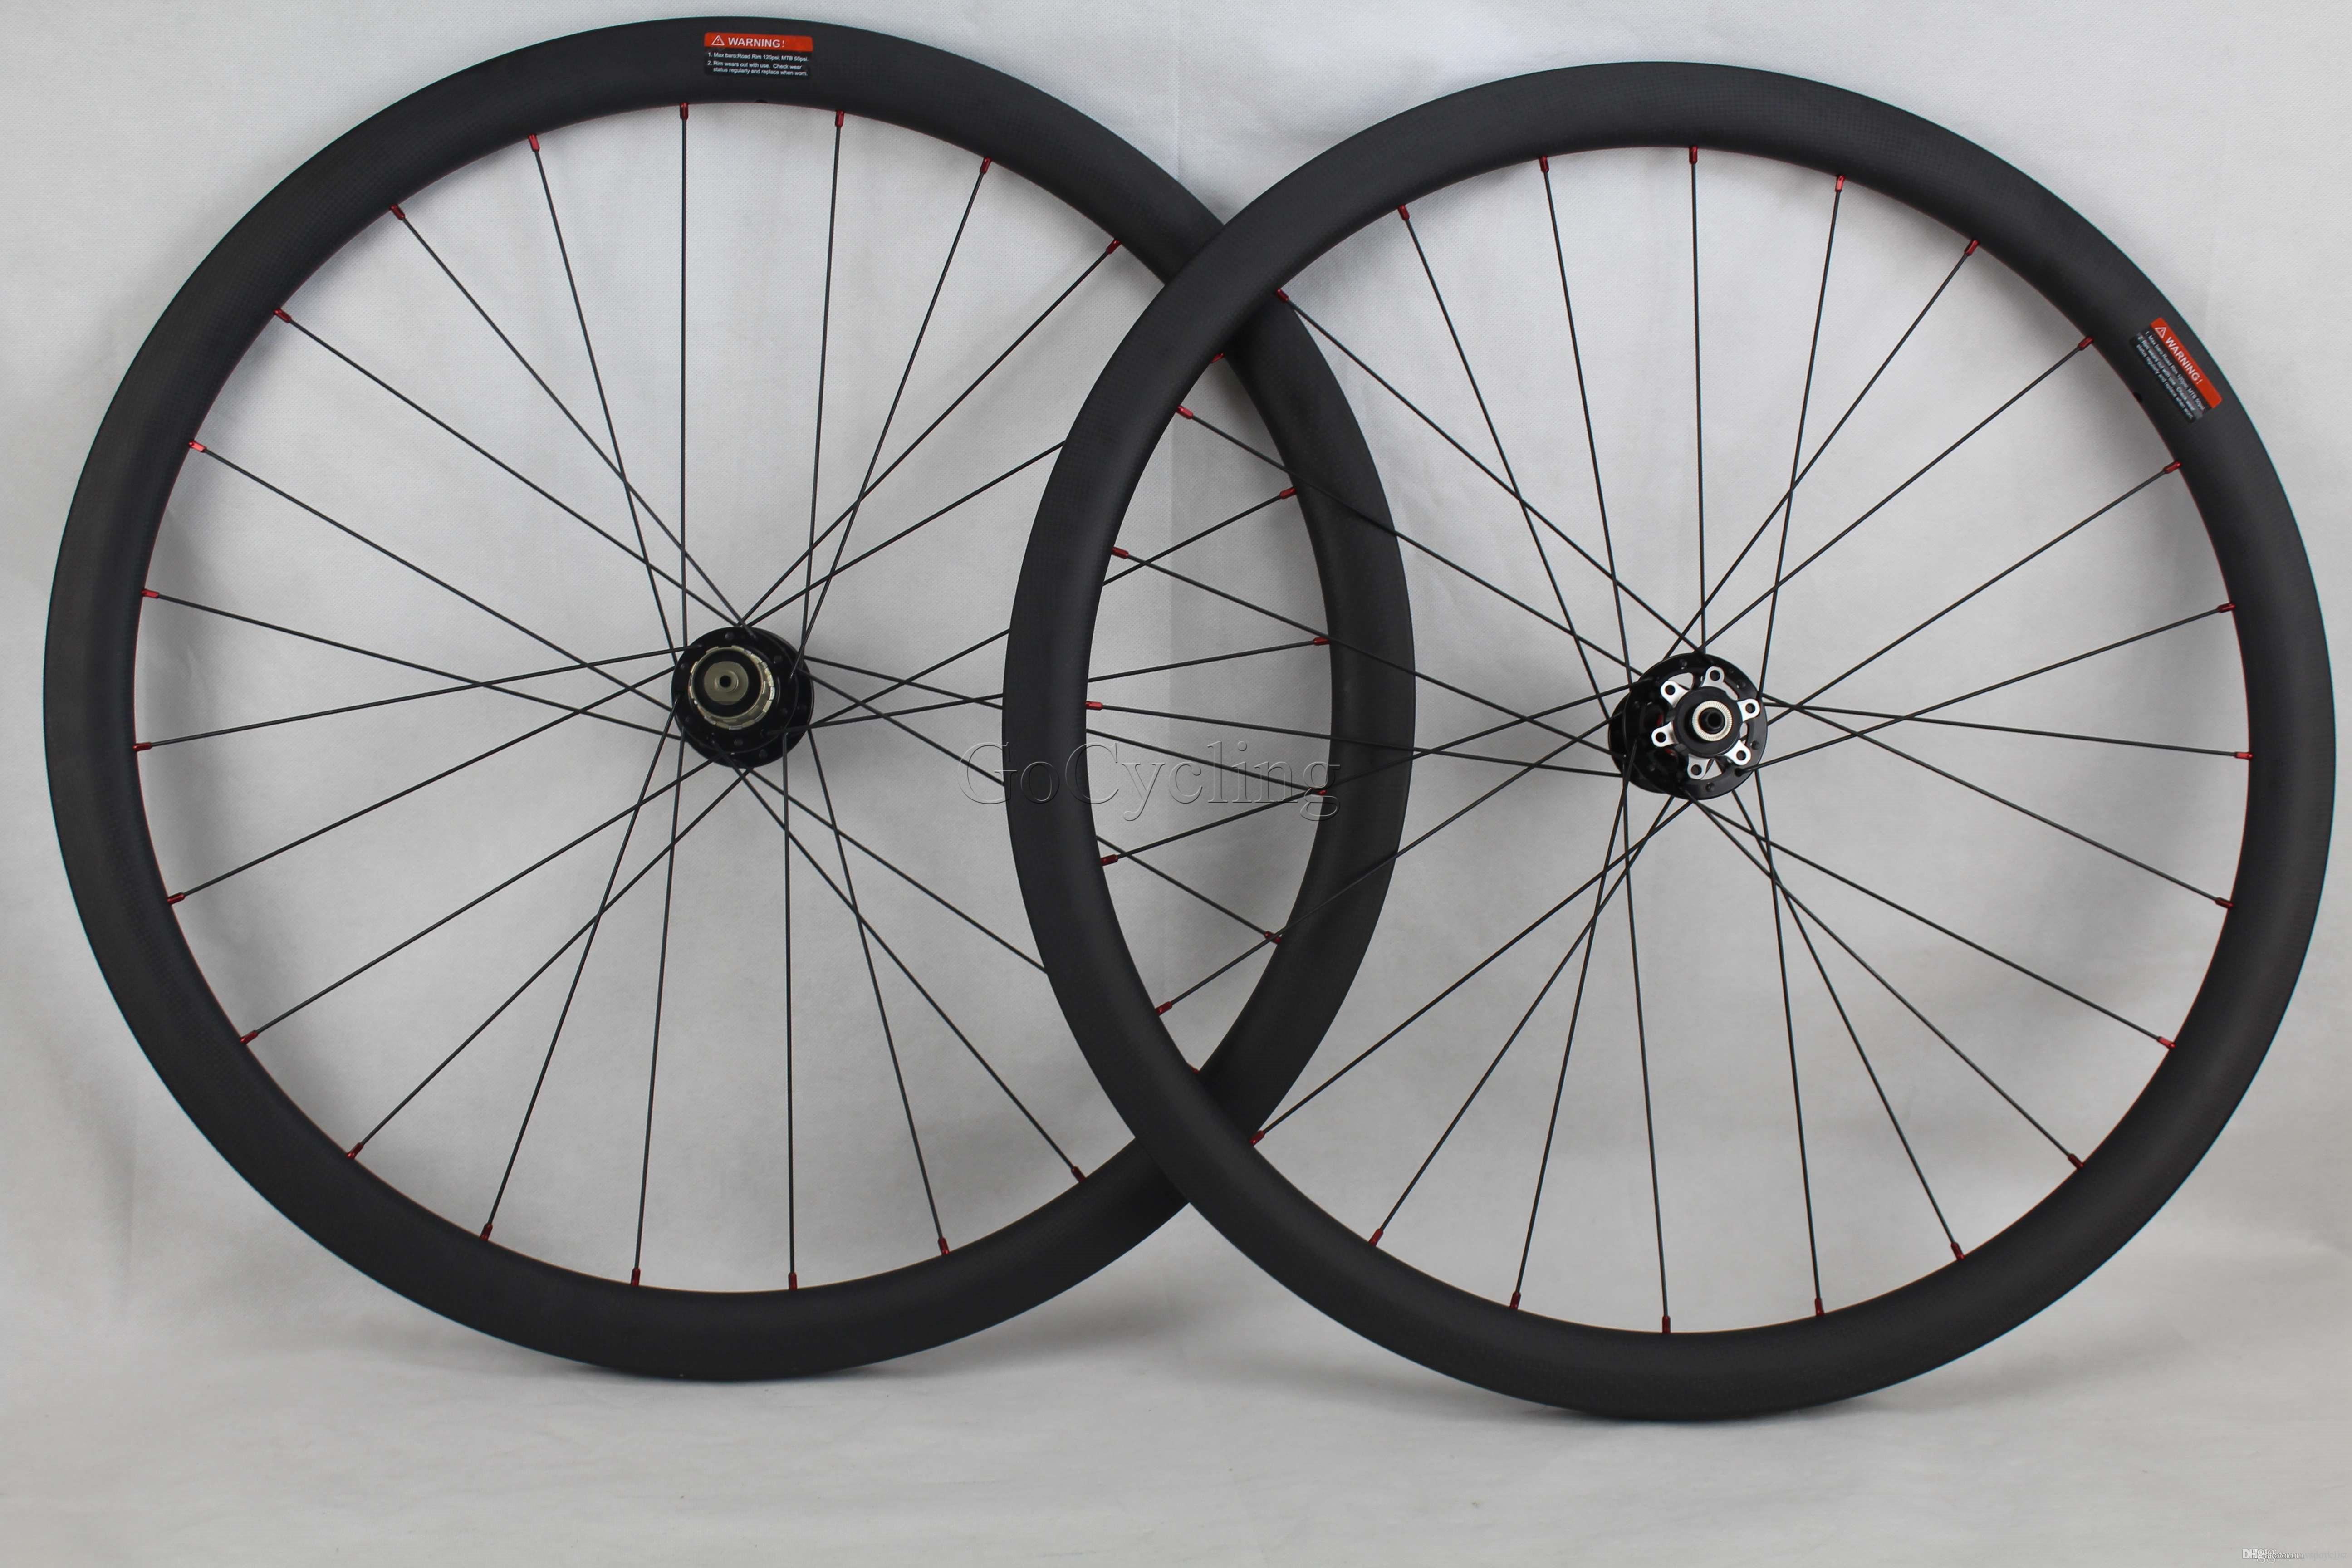 Disc brake carbon road wheels 38mm 700C clincher tubular bicycle carbon wheelset rim width 25mm wheels wheel with novatec hubs